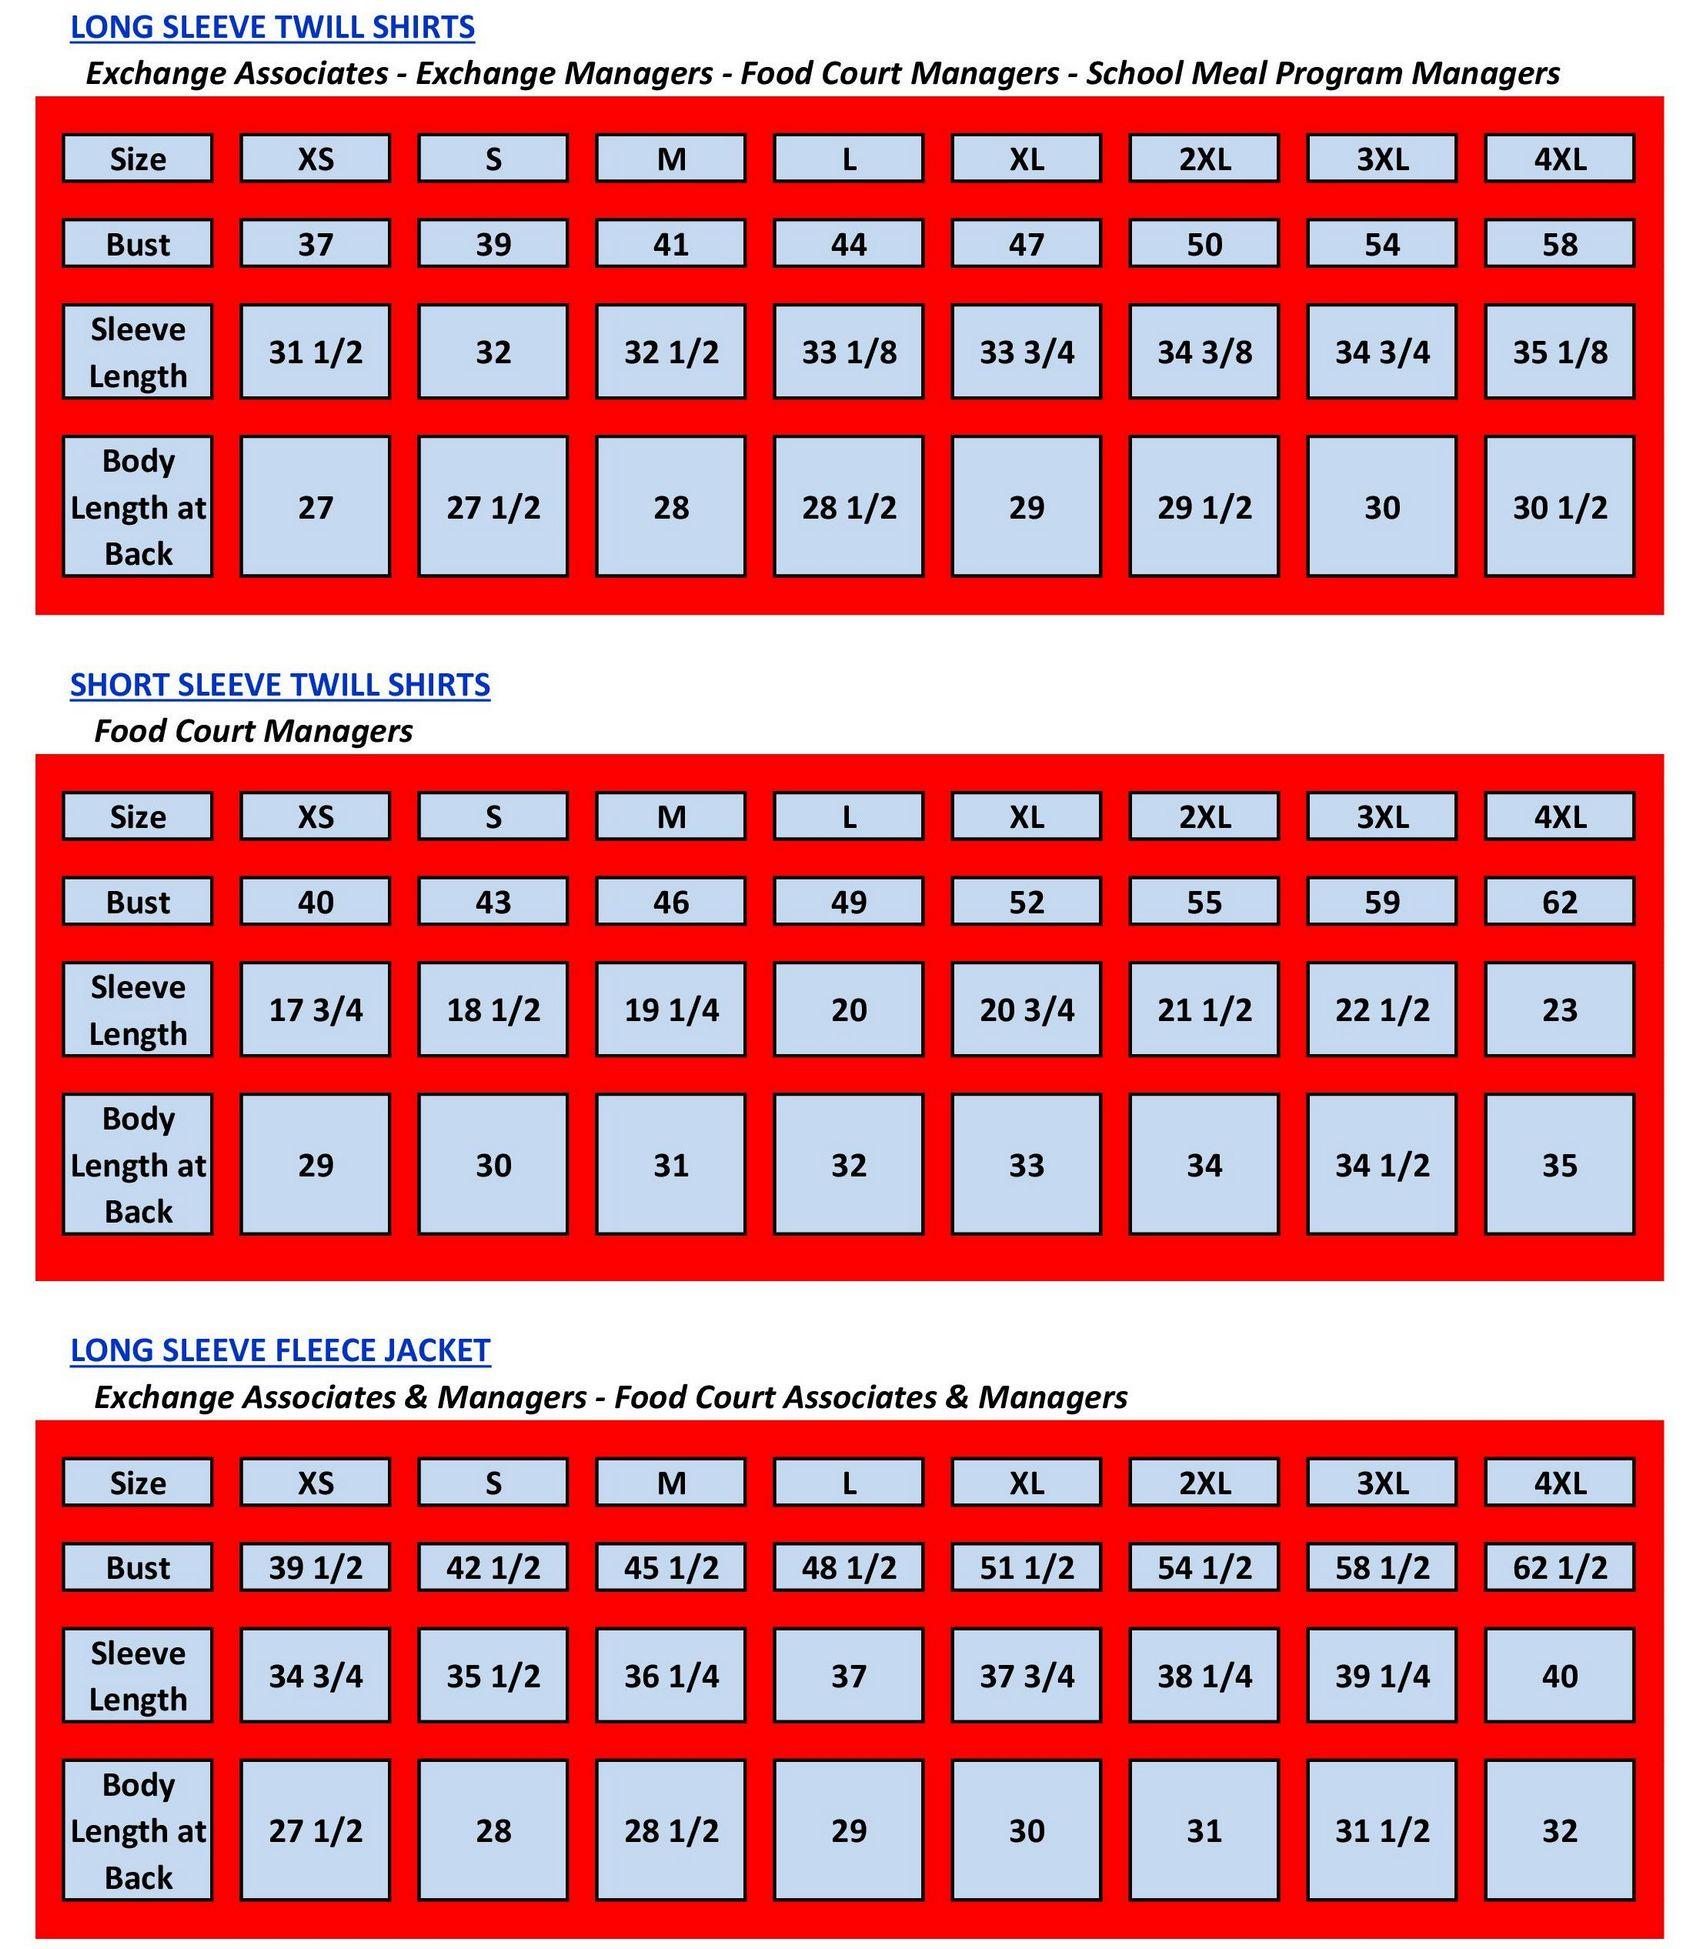 aa-size-chart-ladies-pg-2-140908-final.jpg